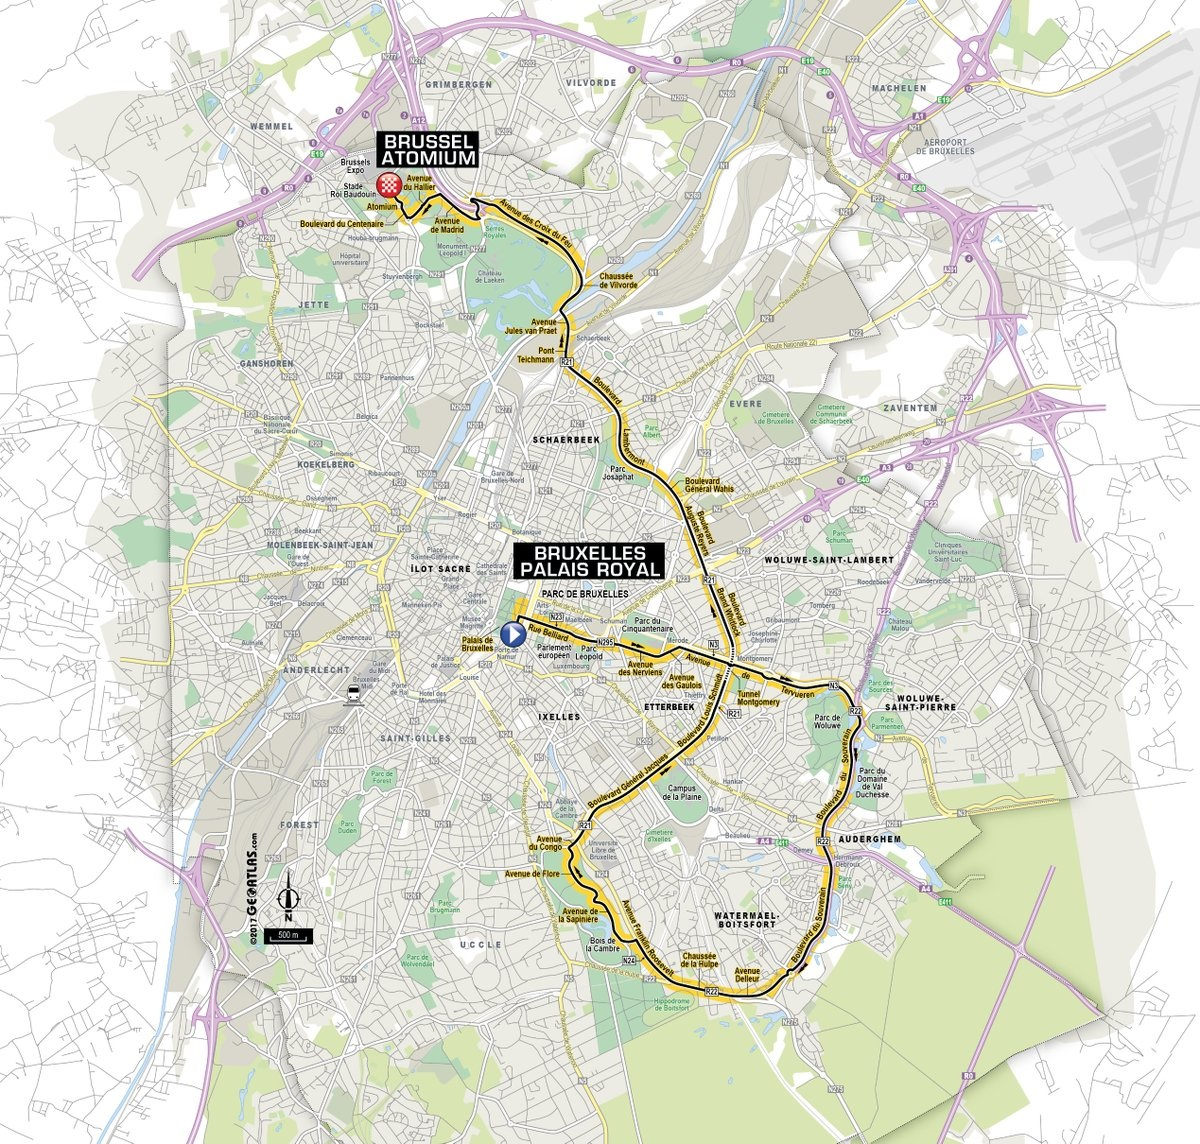 Präsentation des Grand Départ der Tour de France 2019: Die Streckenkarte der 2. Etappe